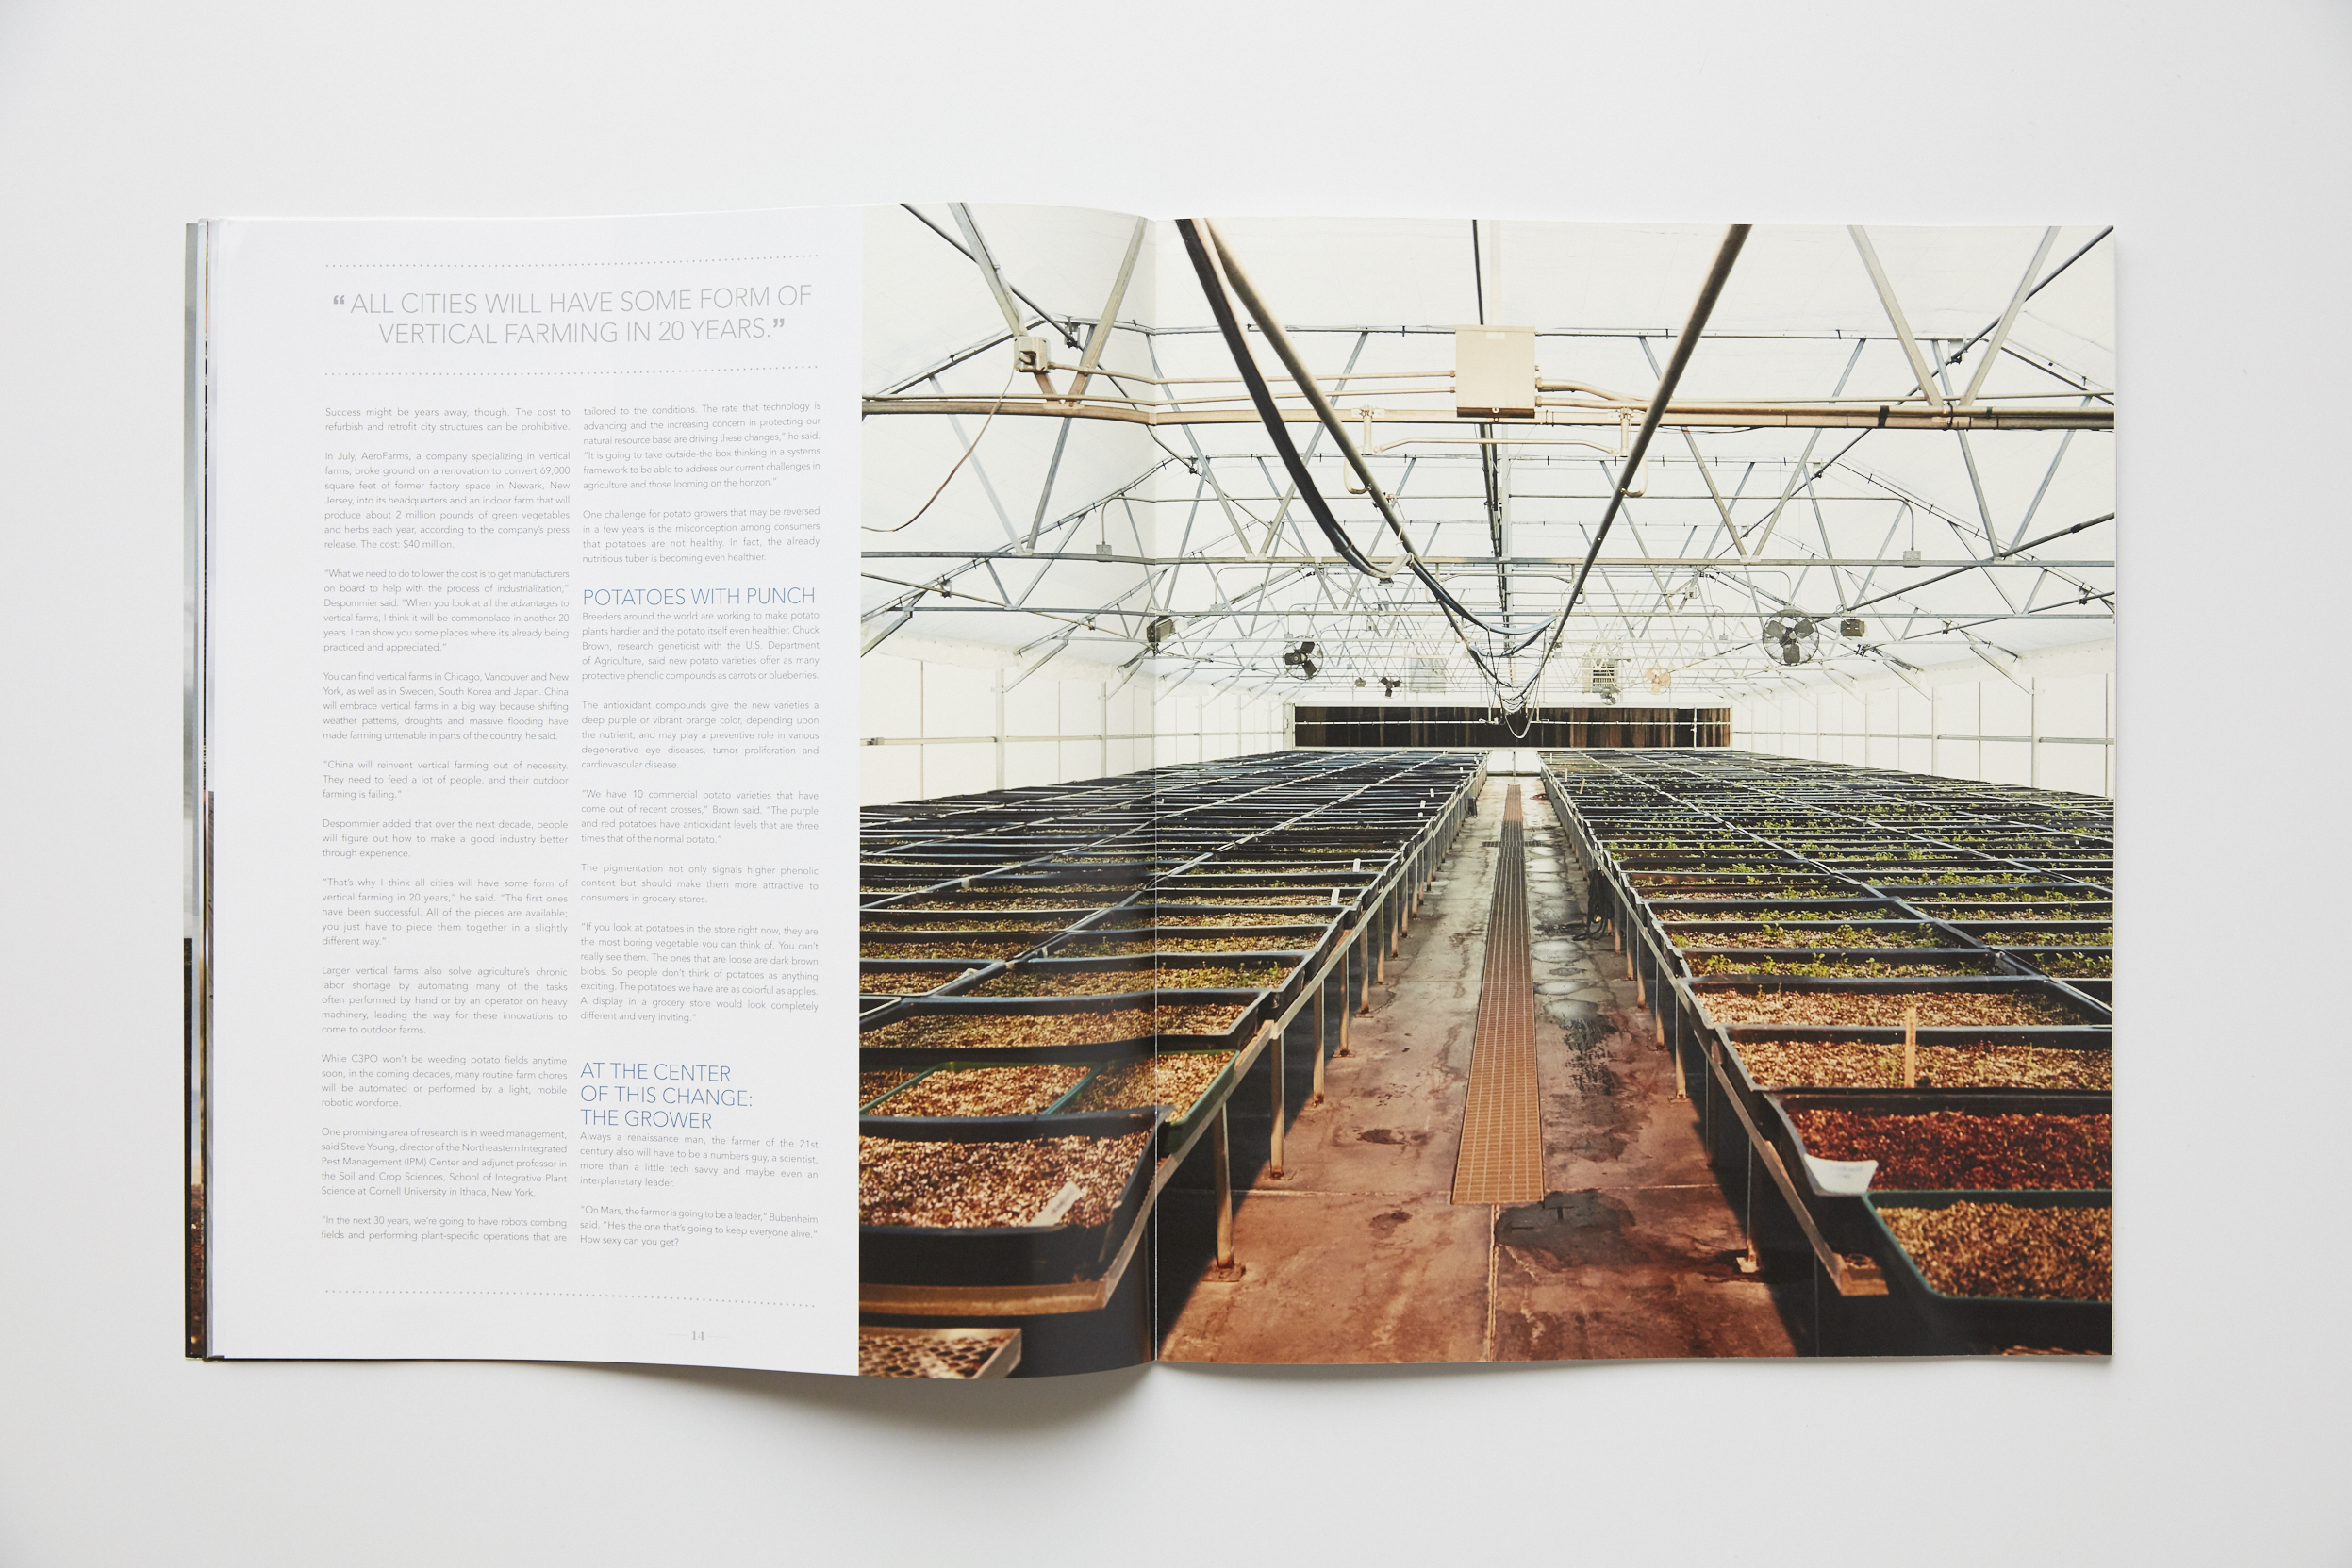 CWT Magazine 005 by Derek Israelsen Green House.jpg